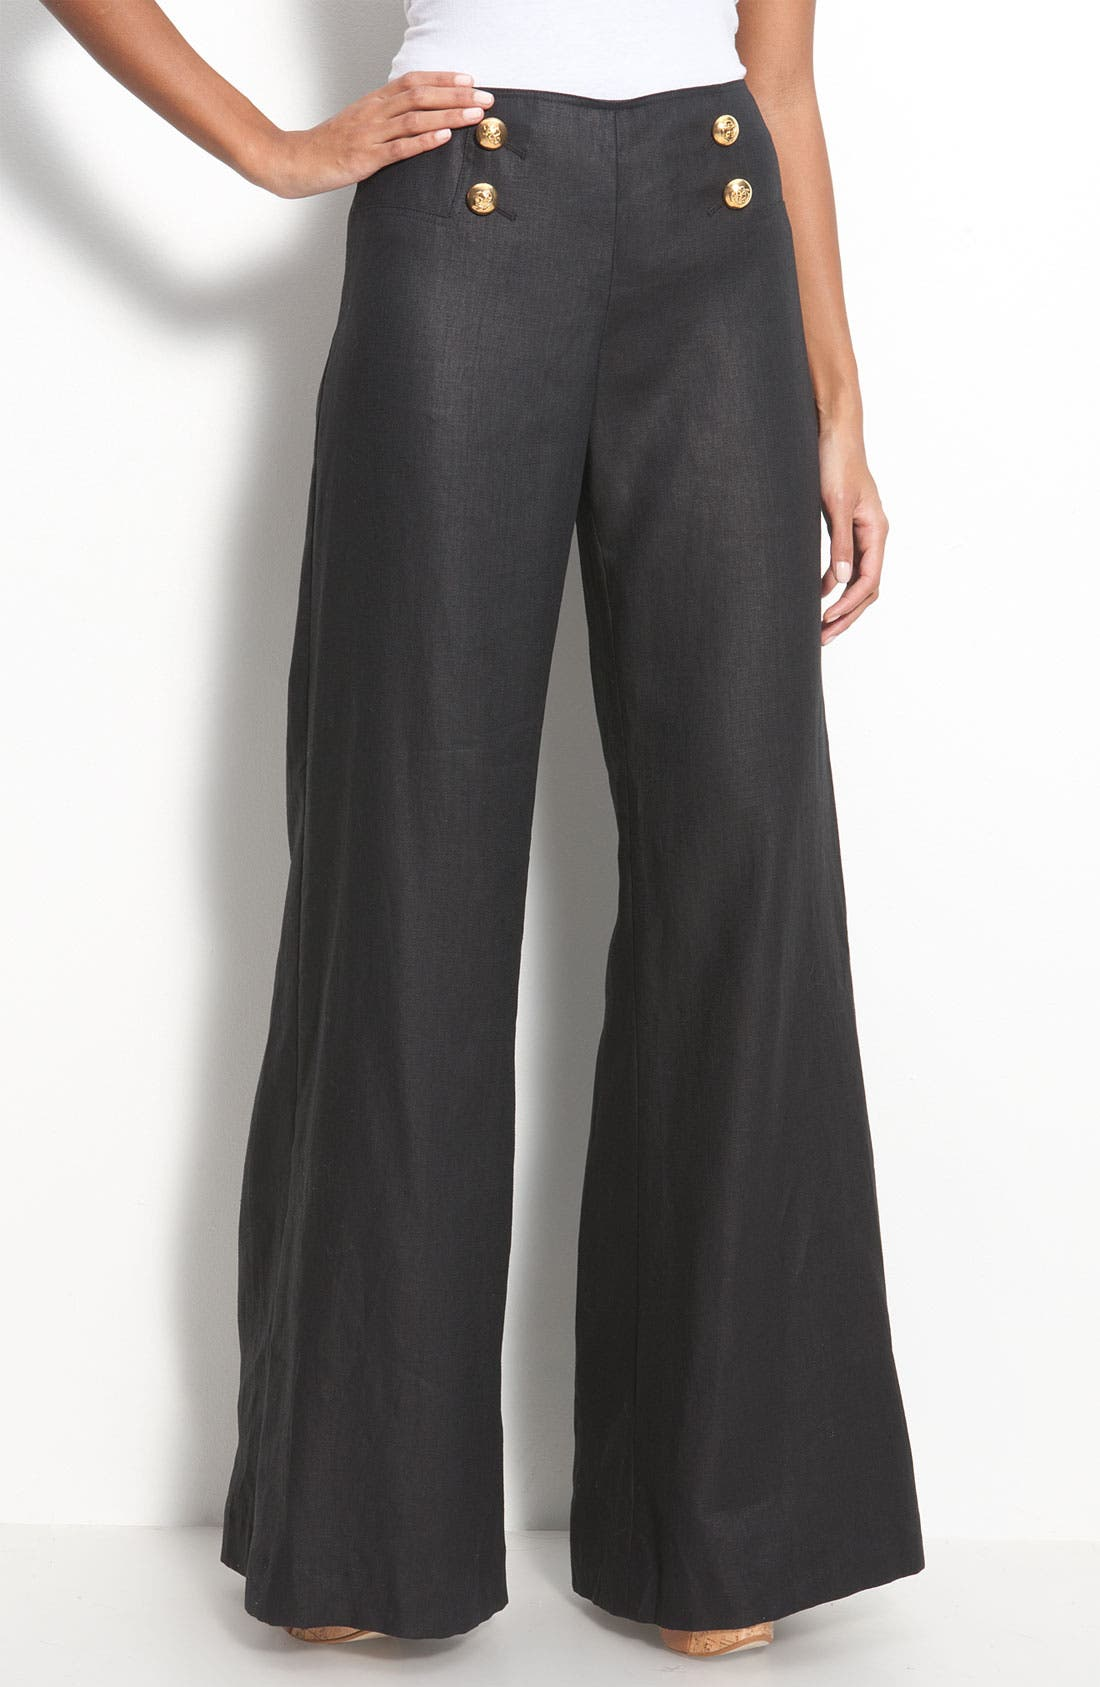 Alternate Image 1 Selected - Lafayette 148 New York 'Lavish Linen' Sailor Pants